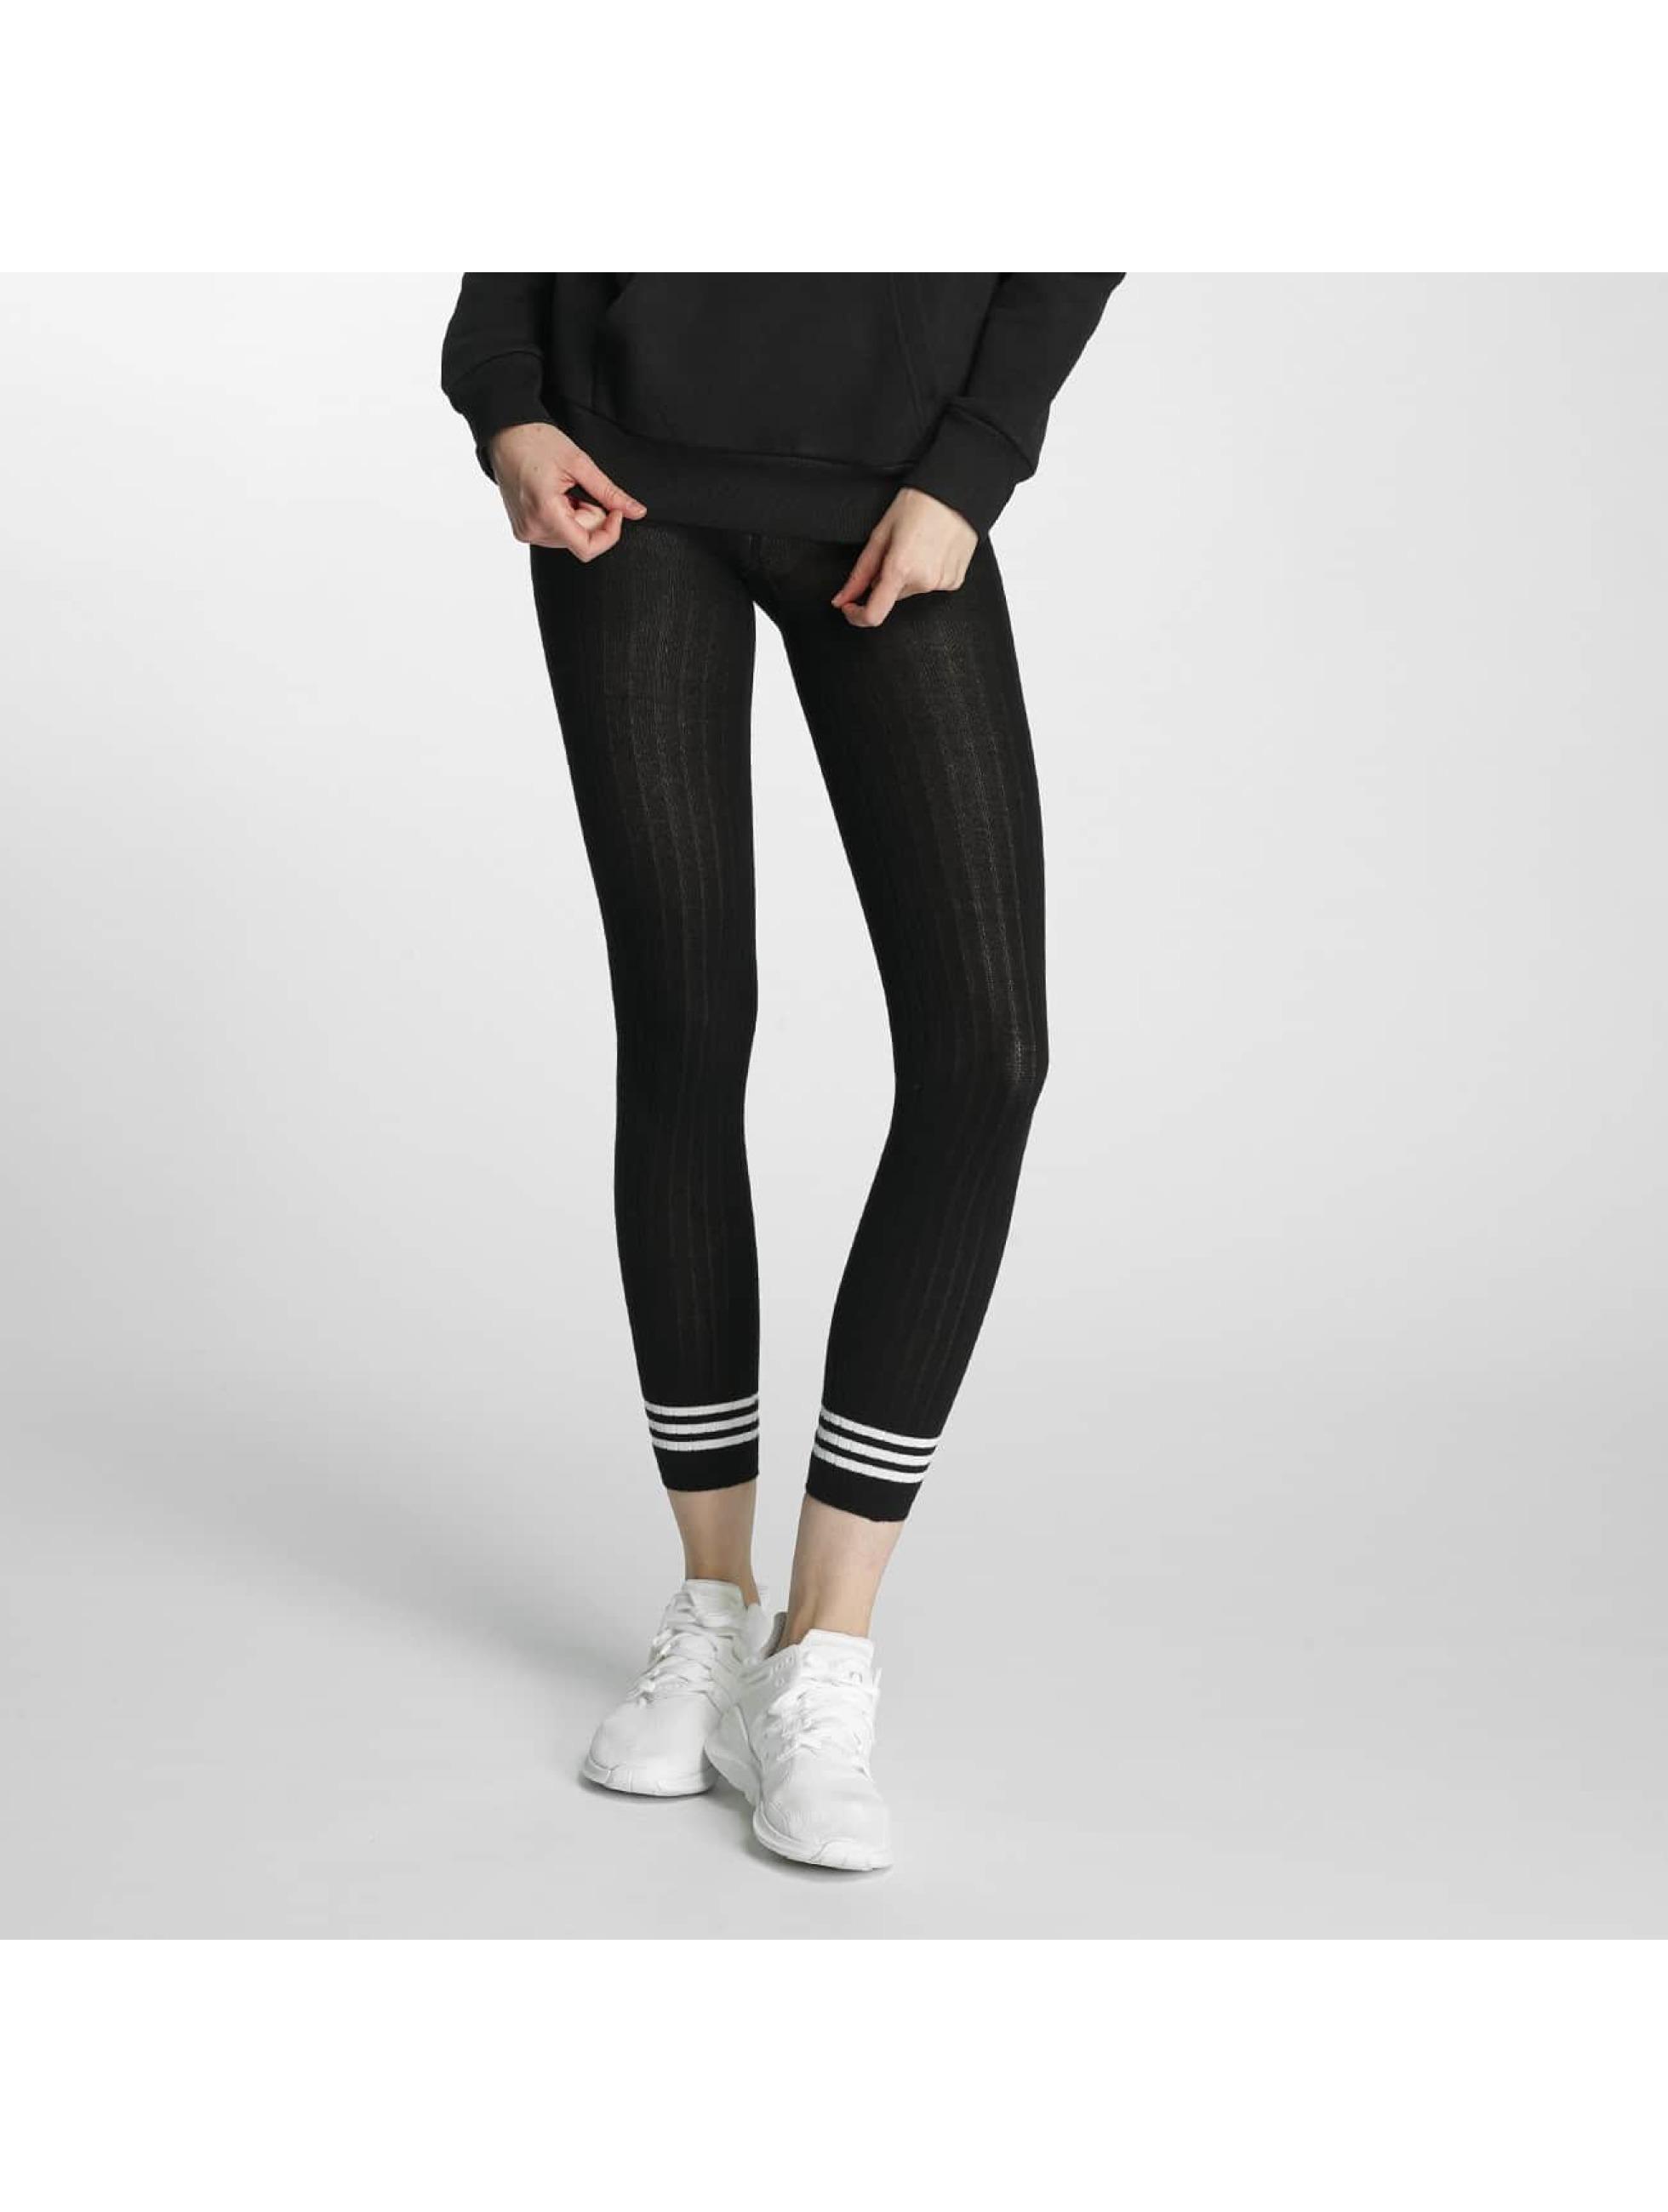 adidas Leginy/Tregginy 3 Stripes čern